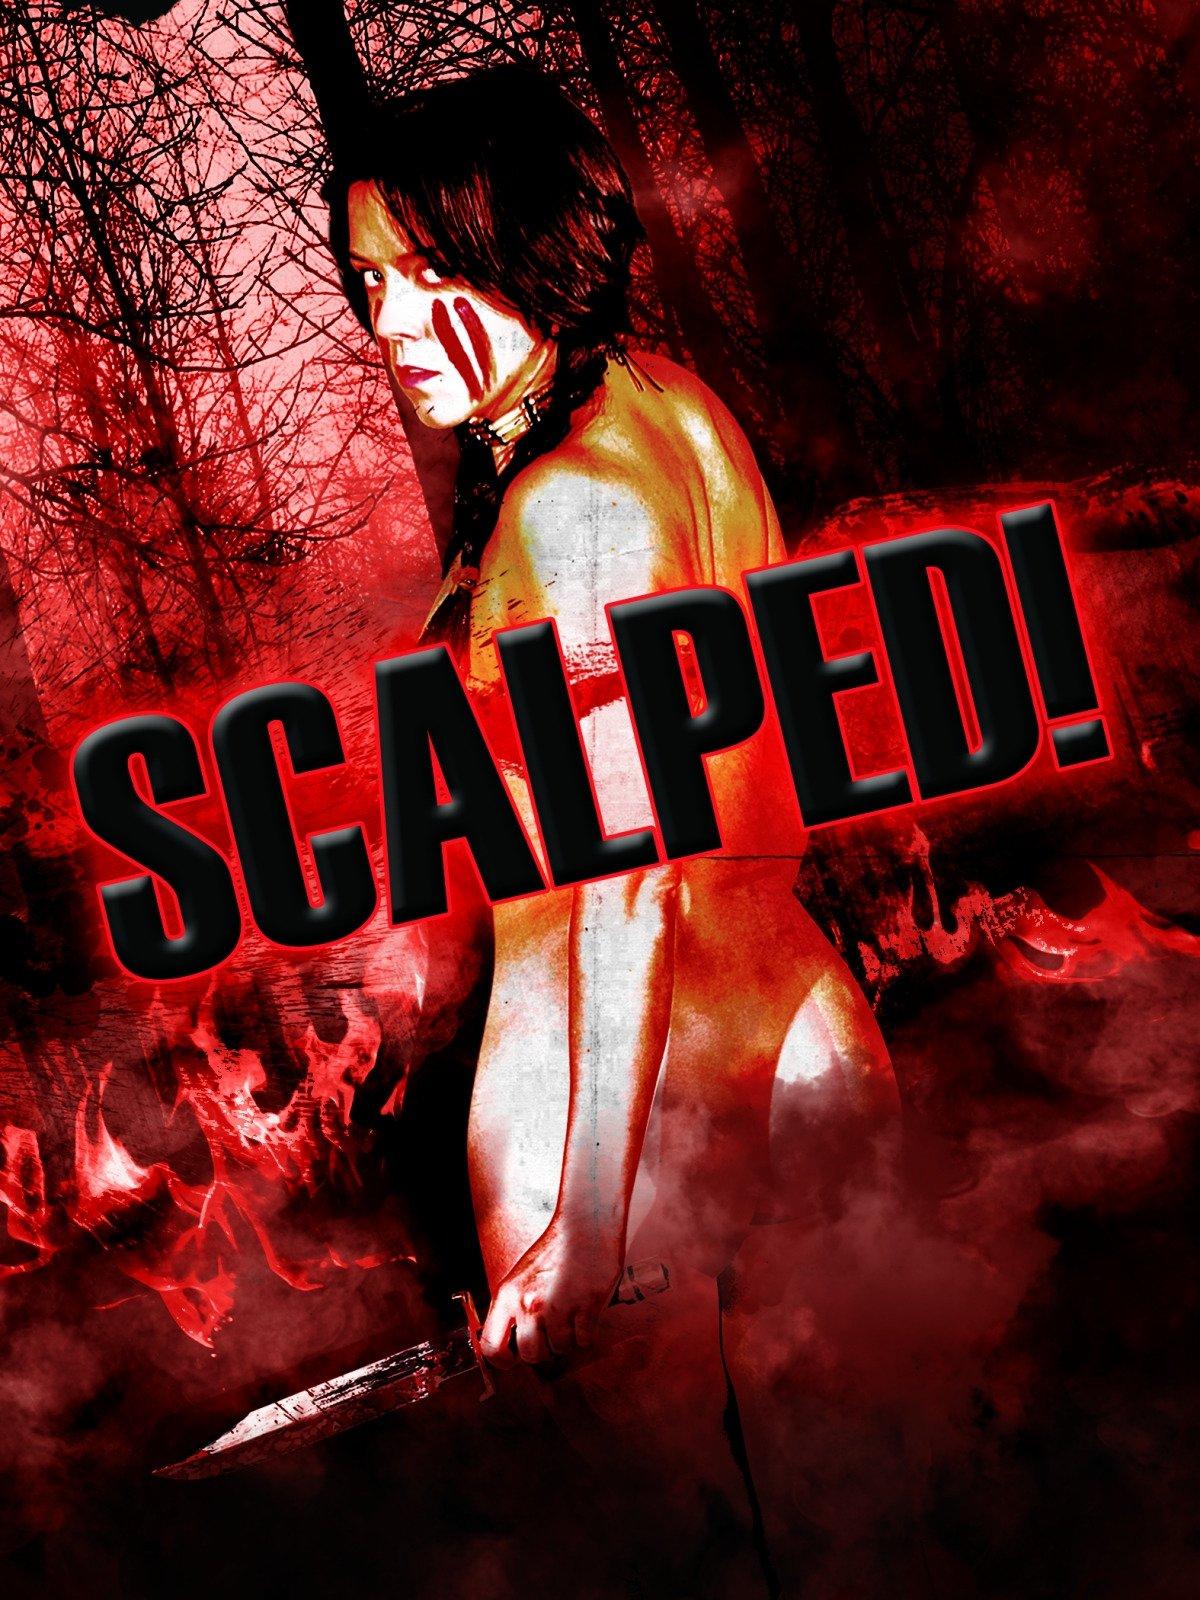 Scalped!